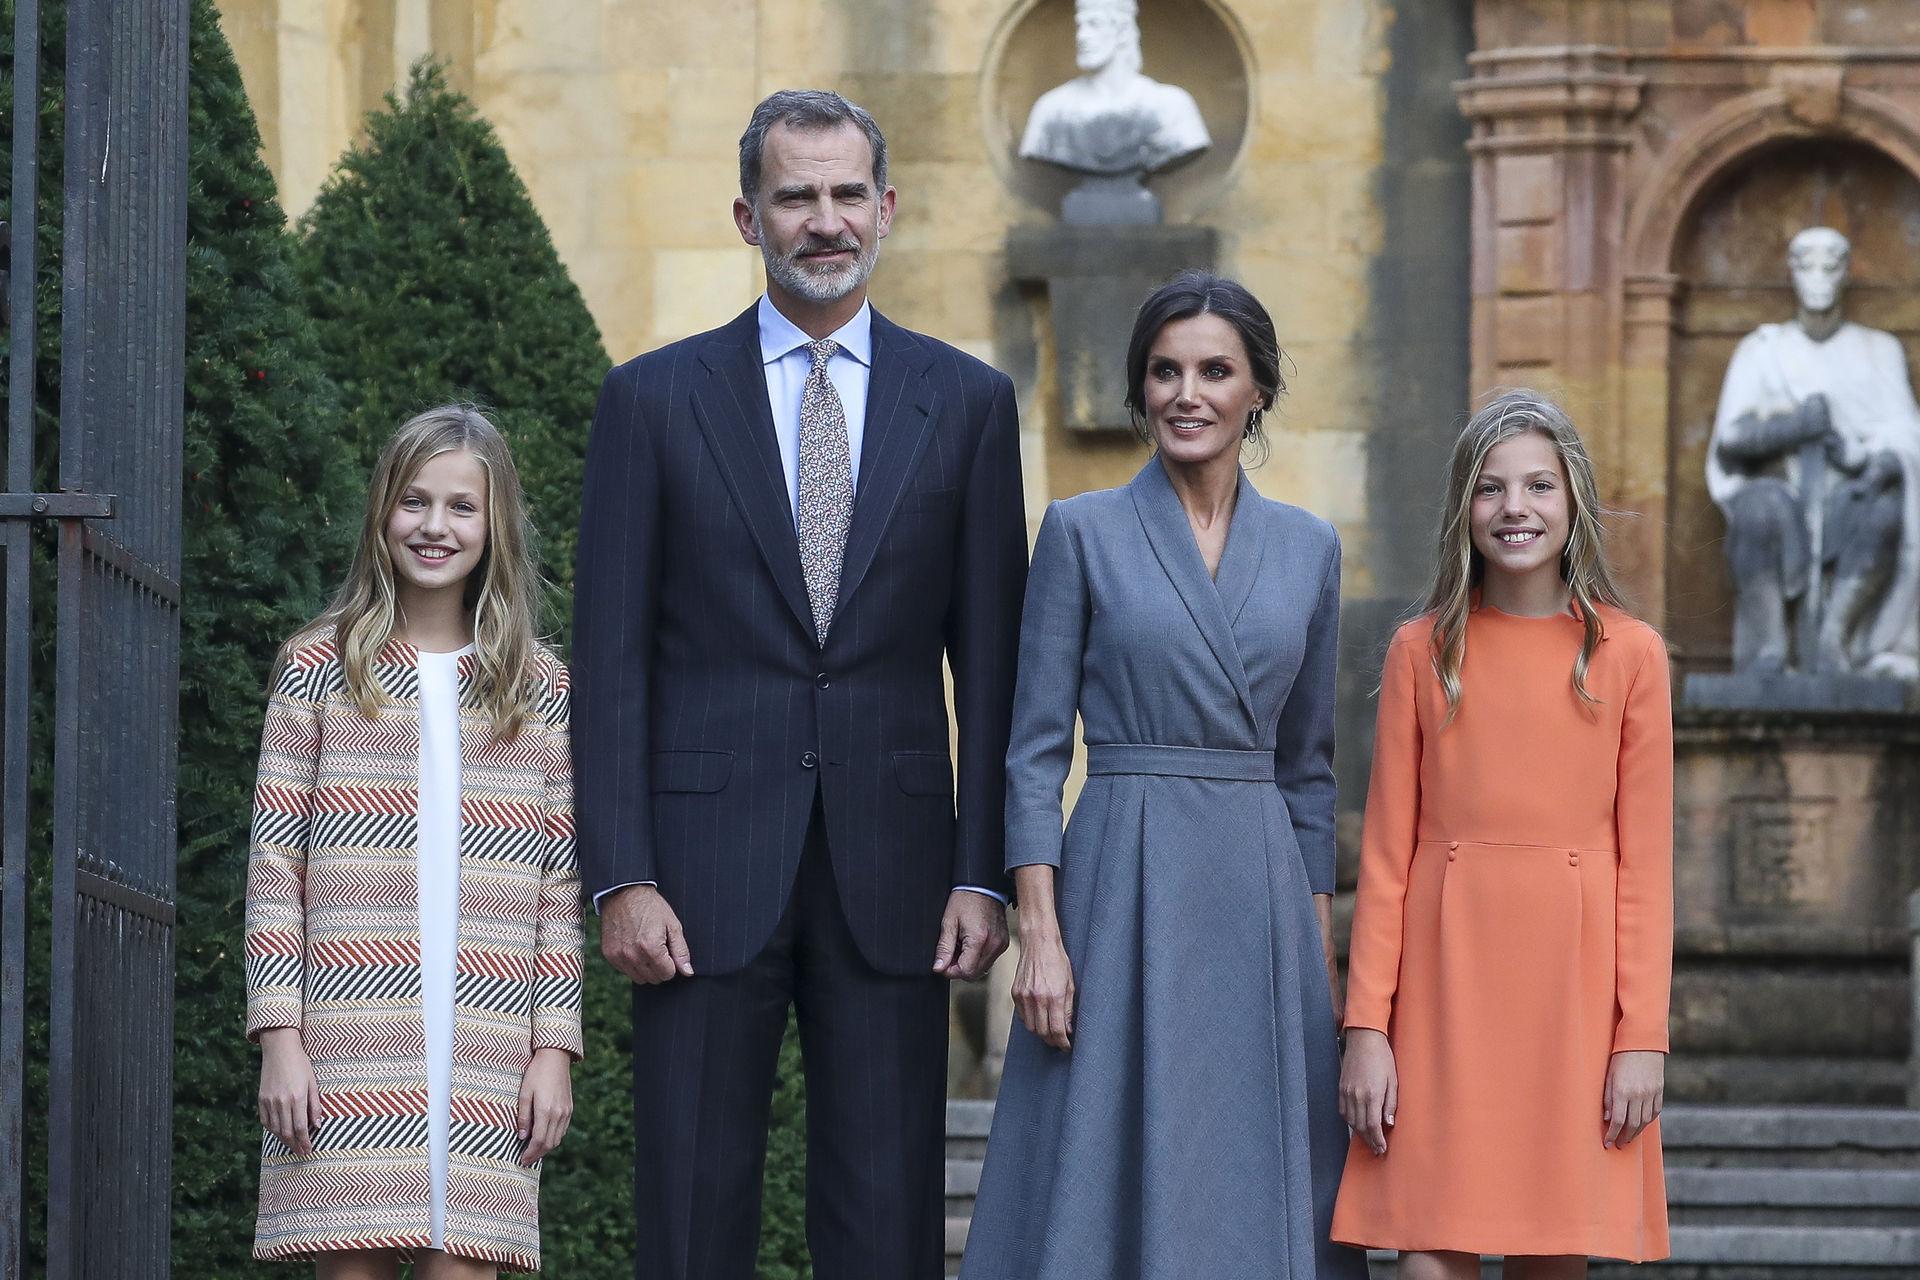 familia-real-oviedo-2019-1.jpg